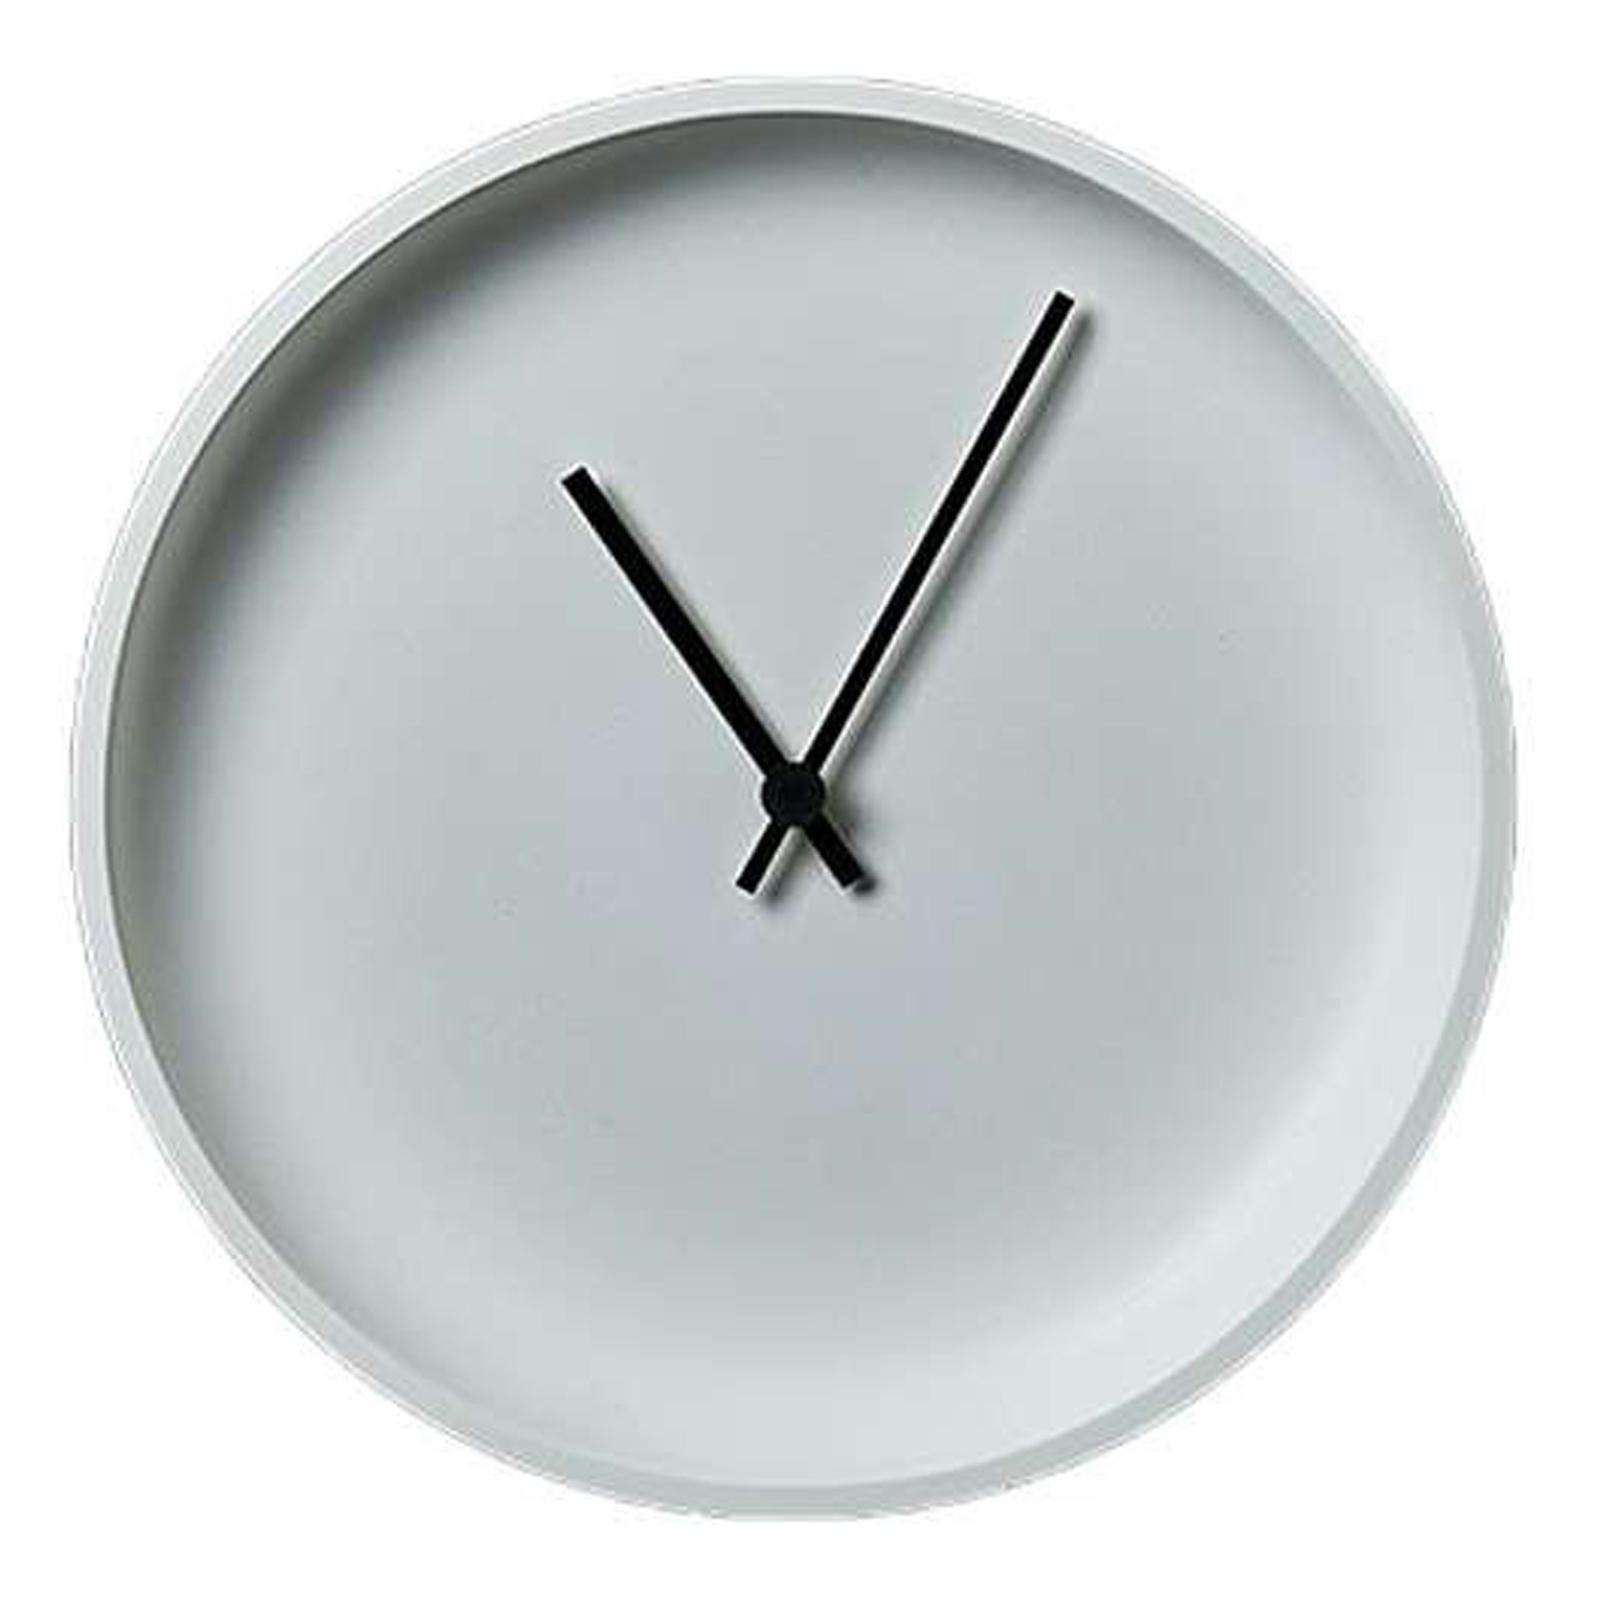 LIKEconcrete - Ida Wall Clock Ø 35 cm - White (93791)